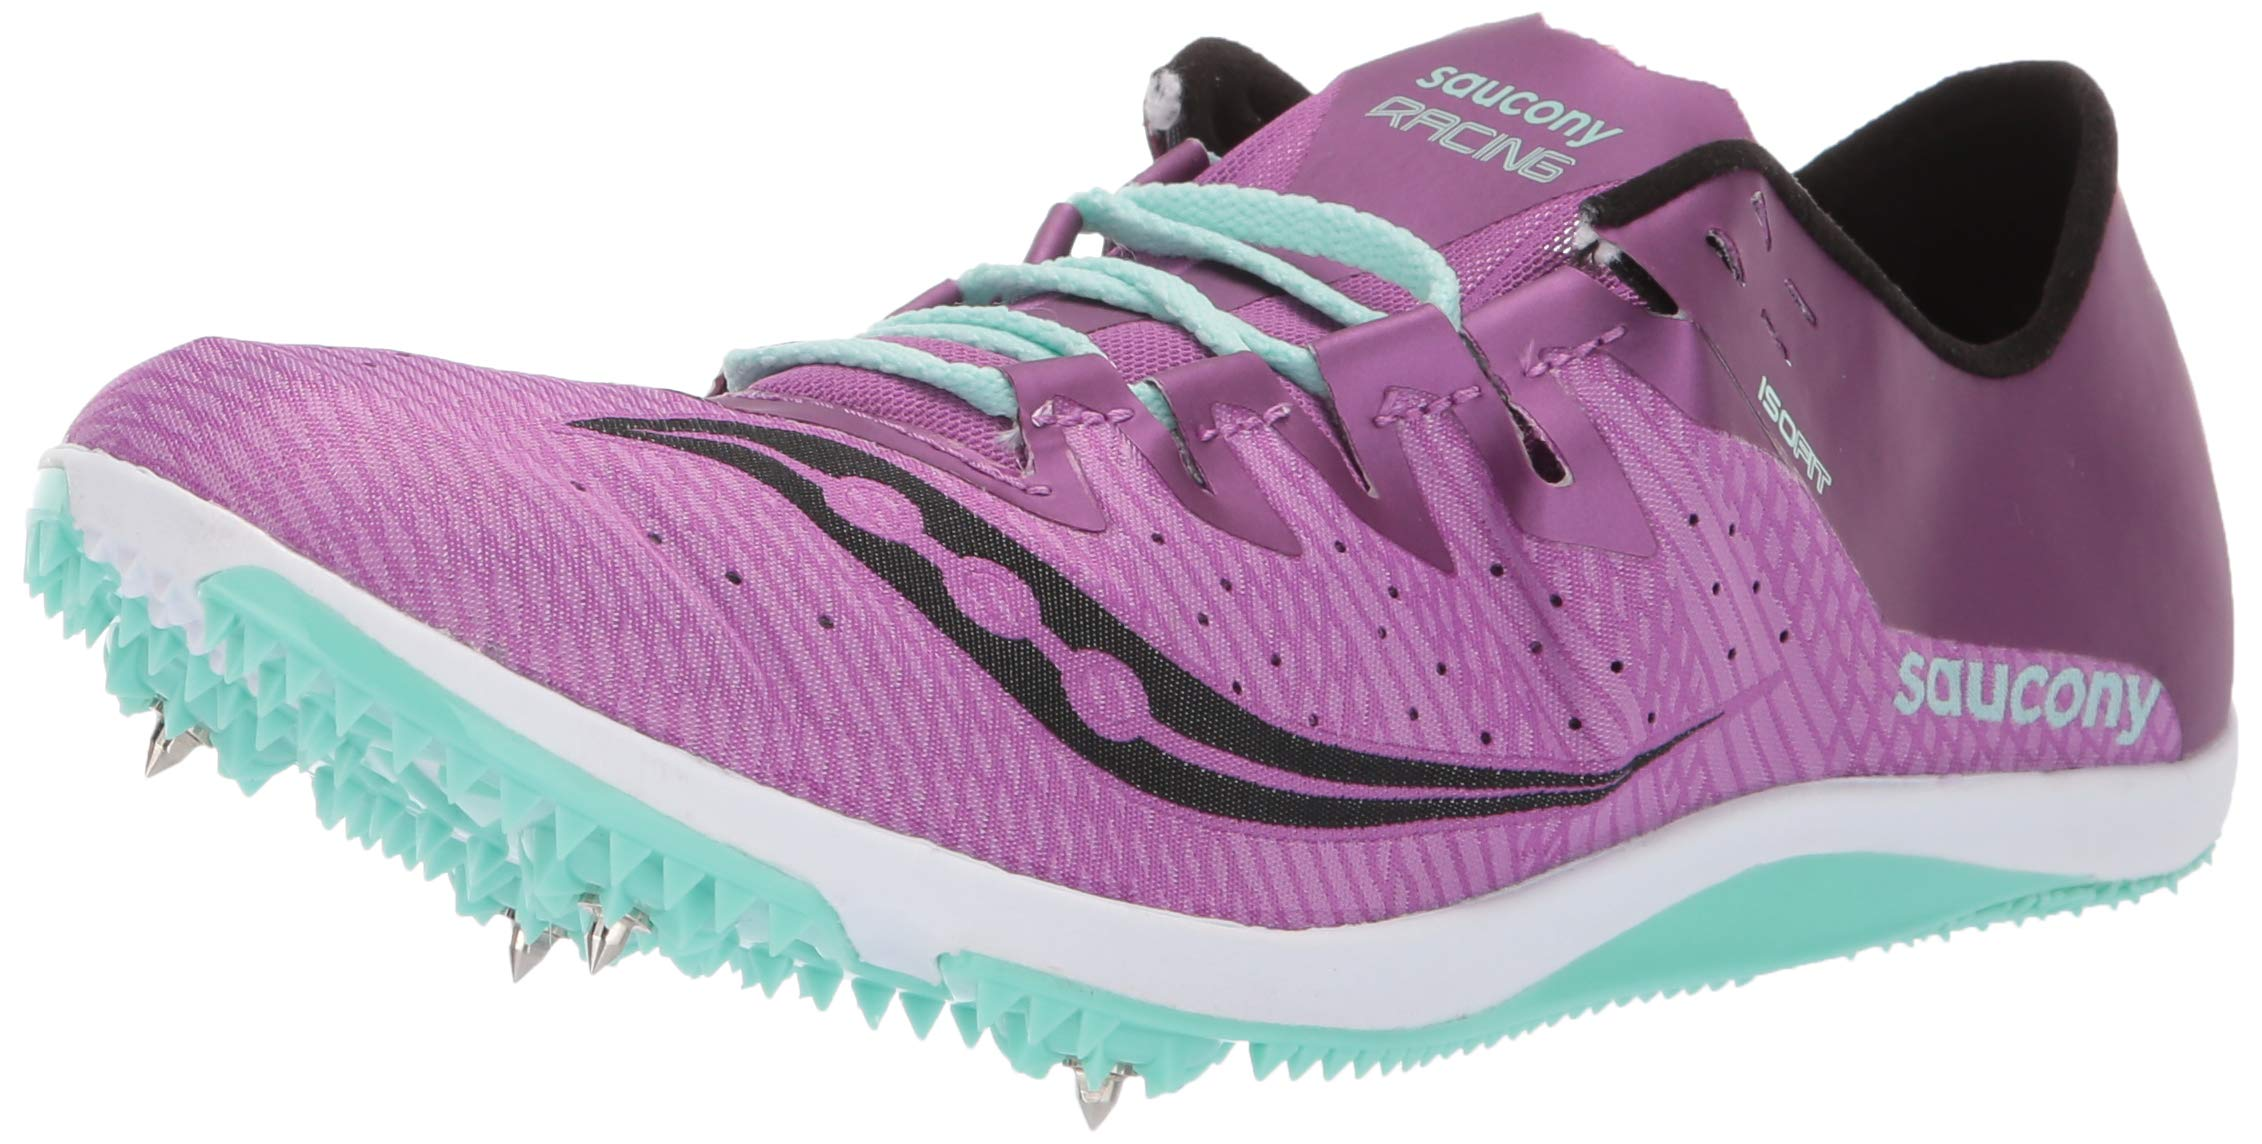 Saucony Women's Endorphin 2 Track Shoe